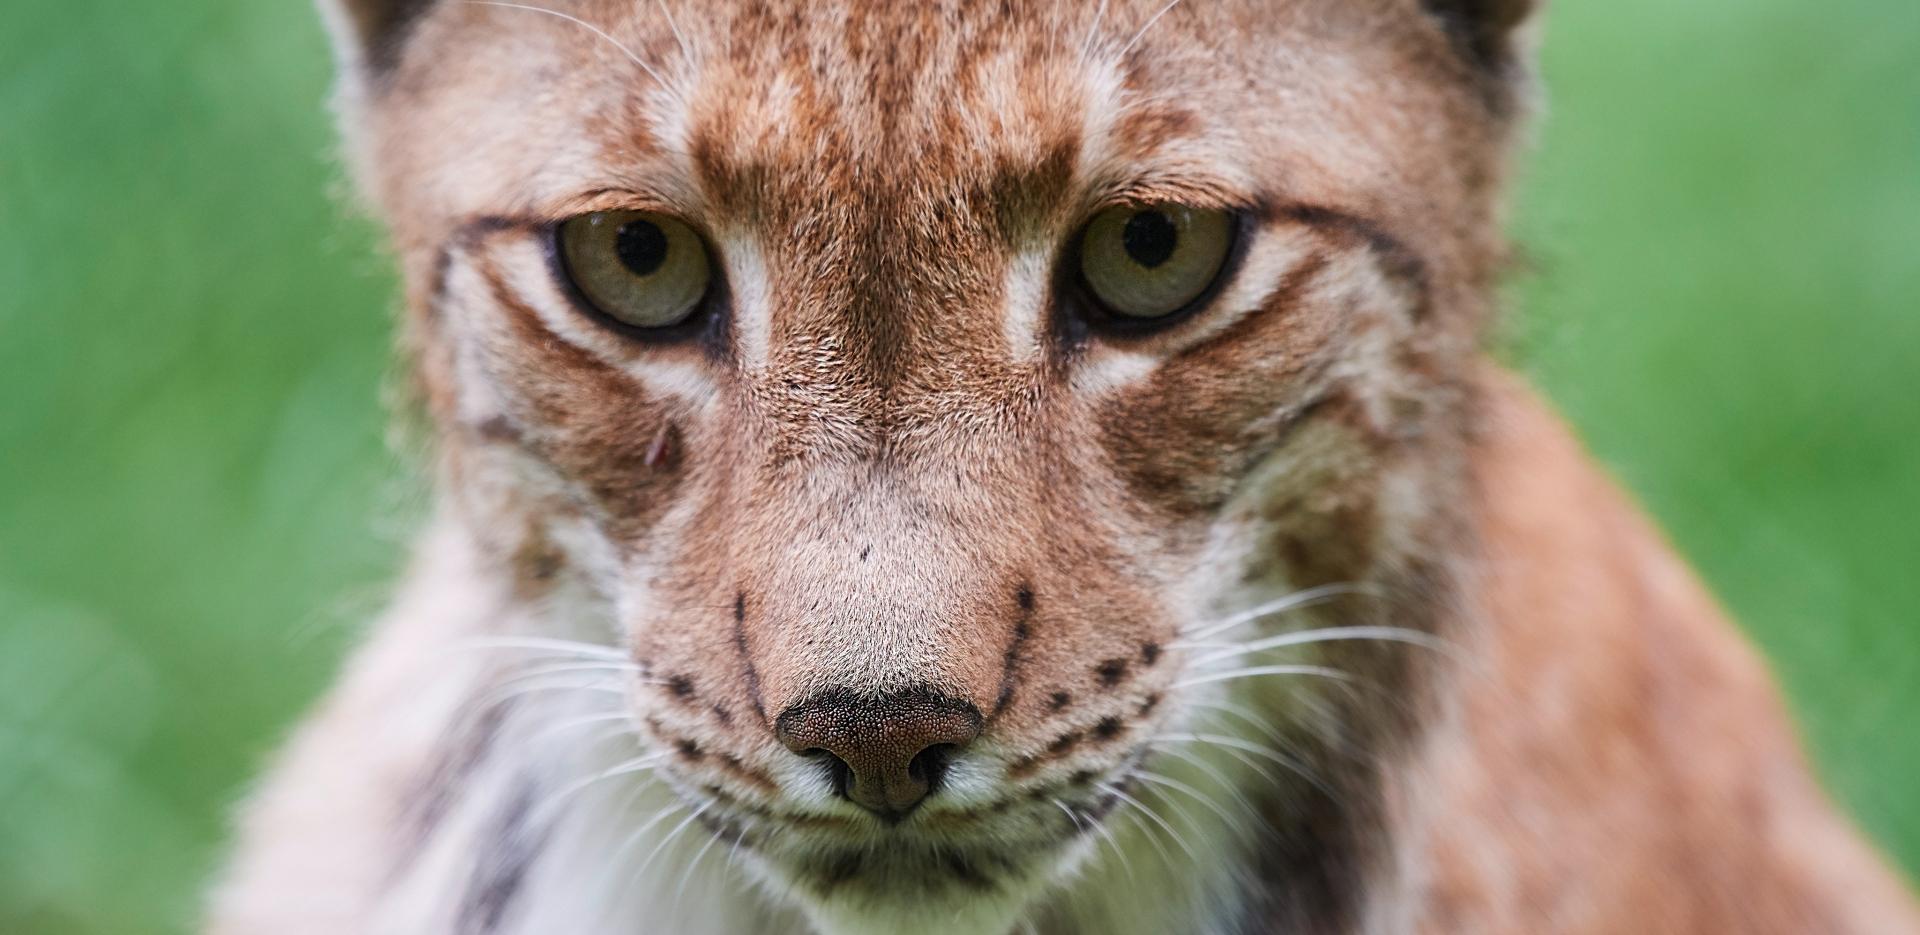 Tierfotografie live - Canon Academy